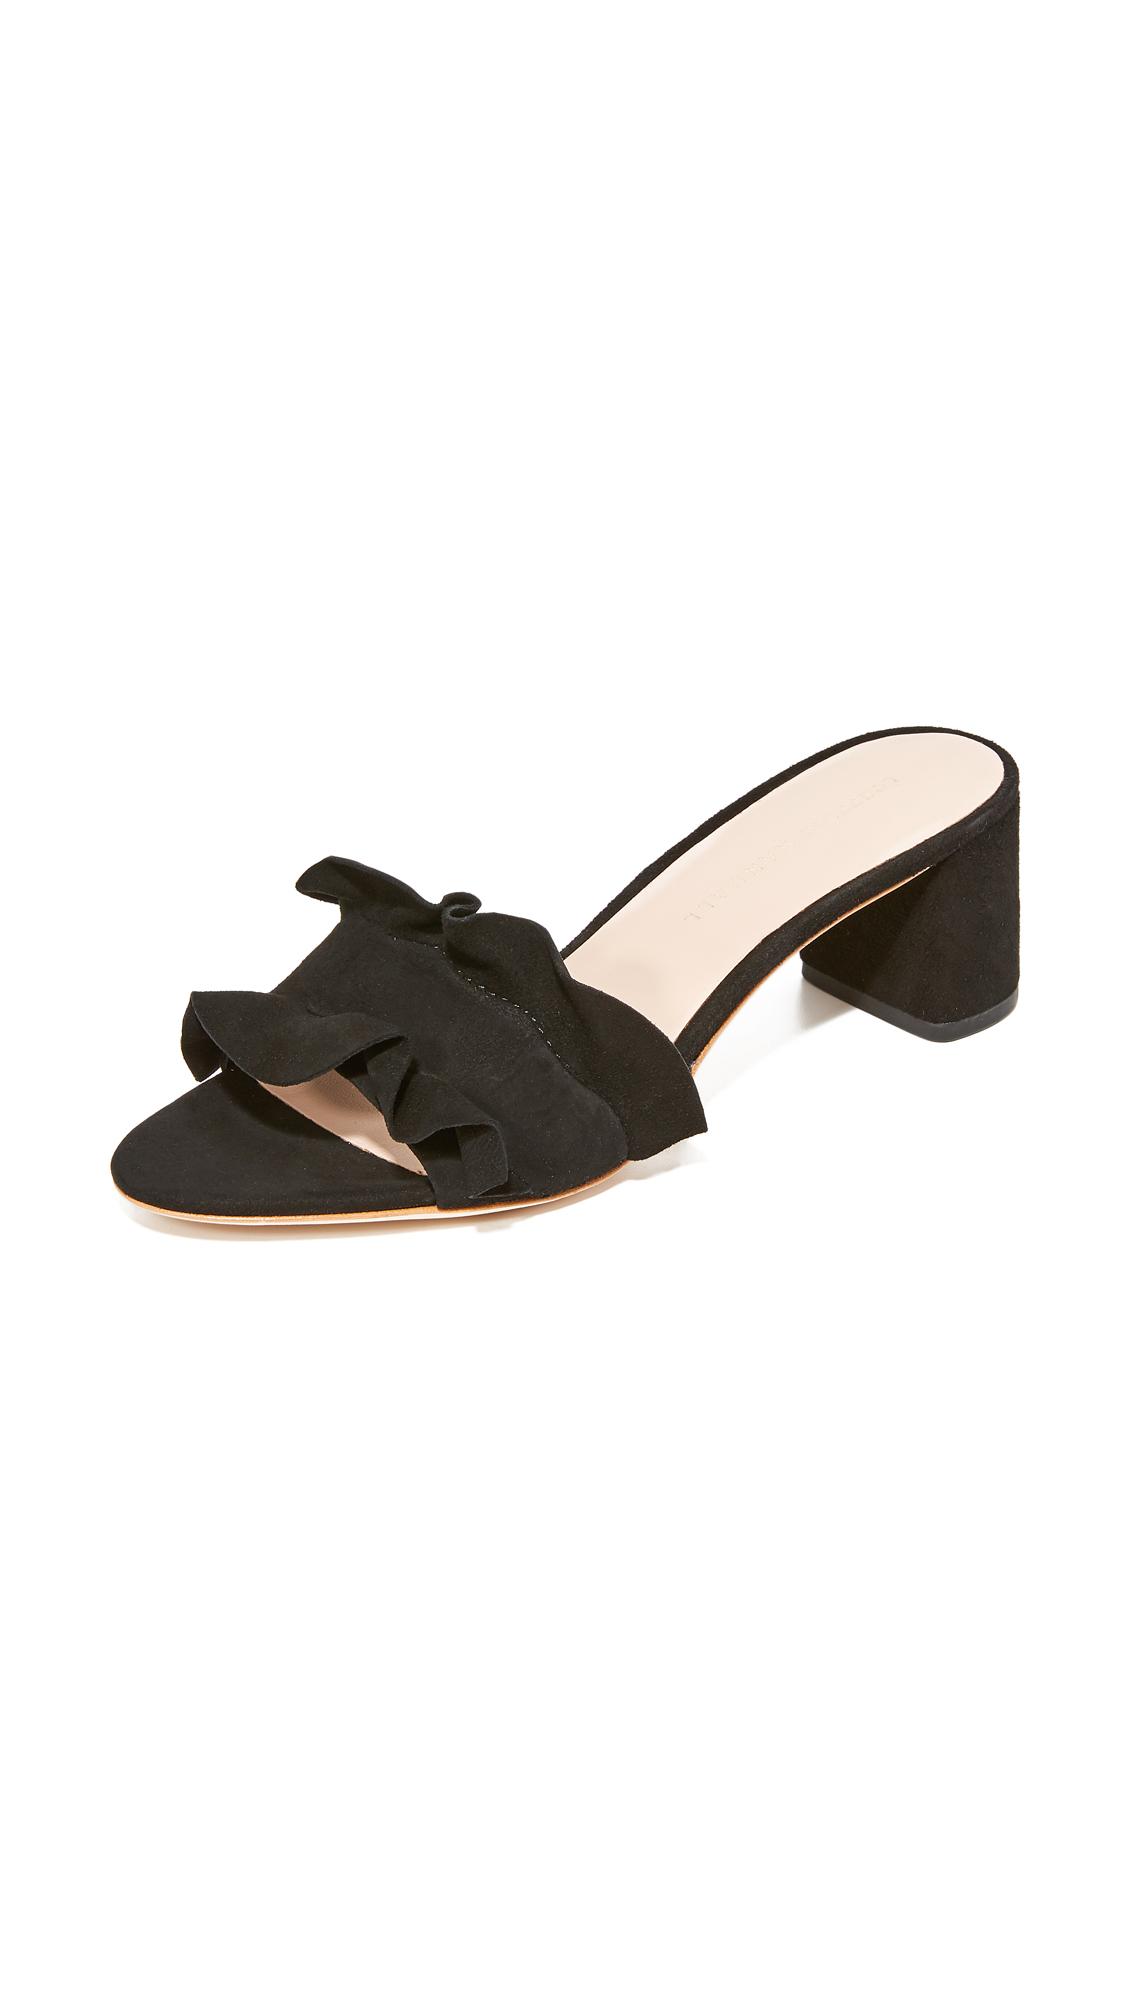 Loeffler Randall Vera City Slides - Black